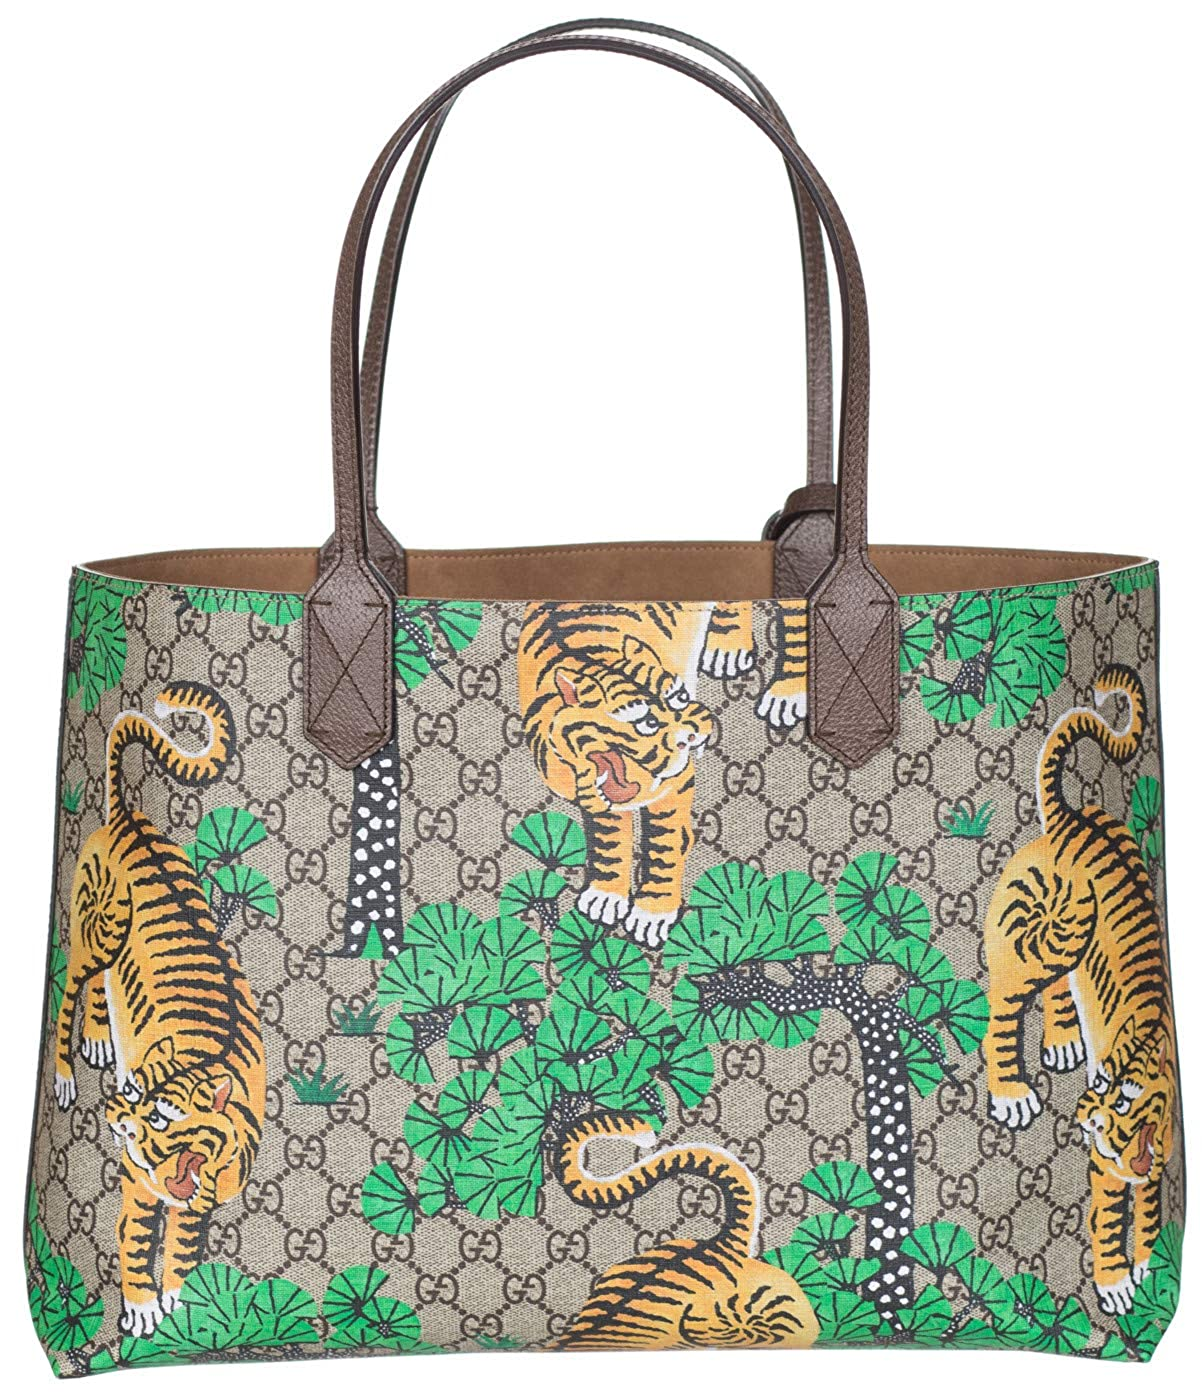 959d30c2e0b1d1 Gucci GG Supreme Leather Bengal Tiger Tote Shoulder Bag: Amazon.co.uk:  Shoes & Bags